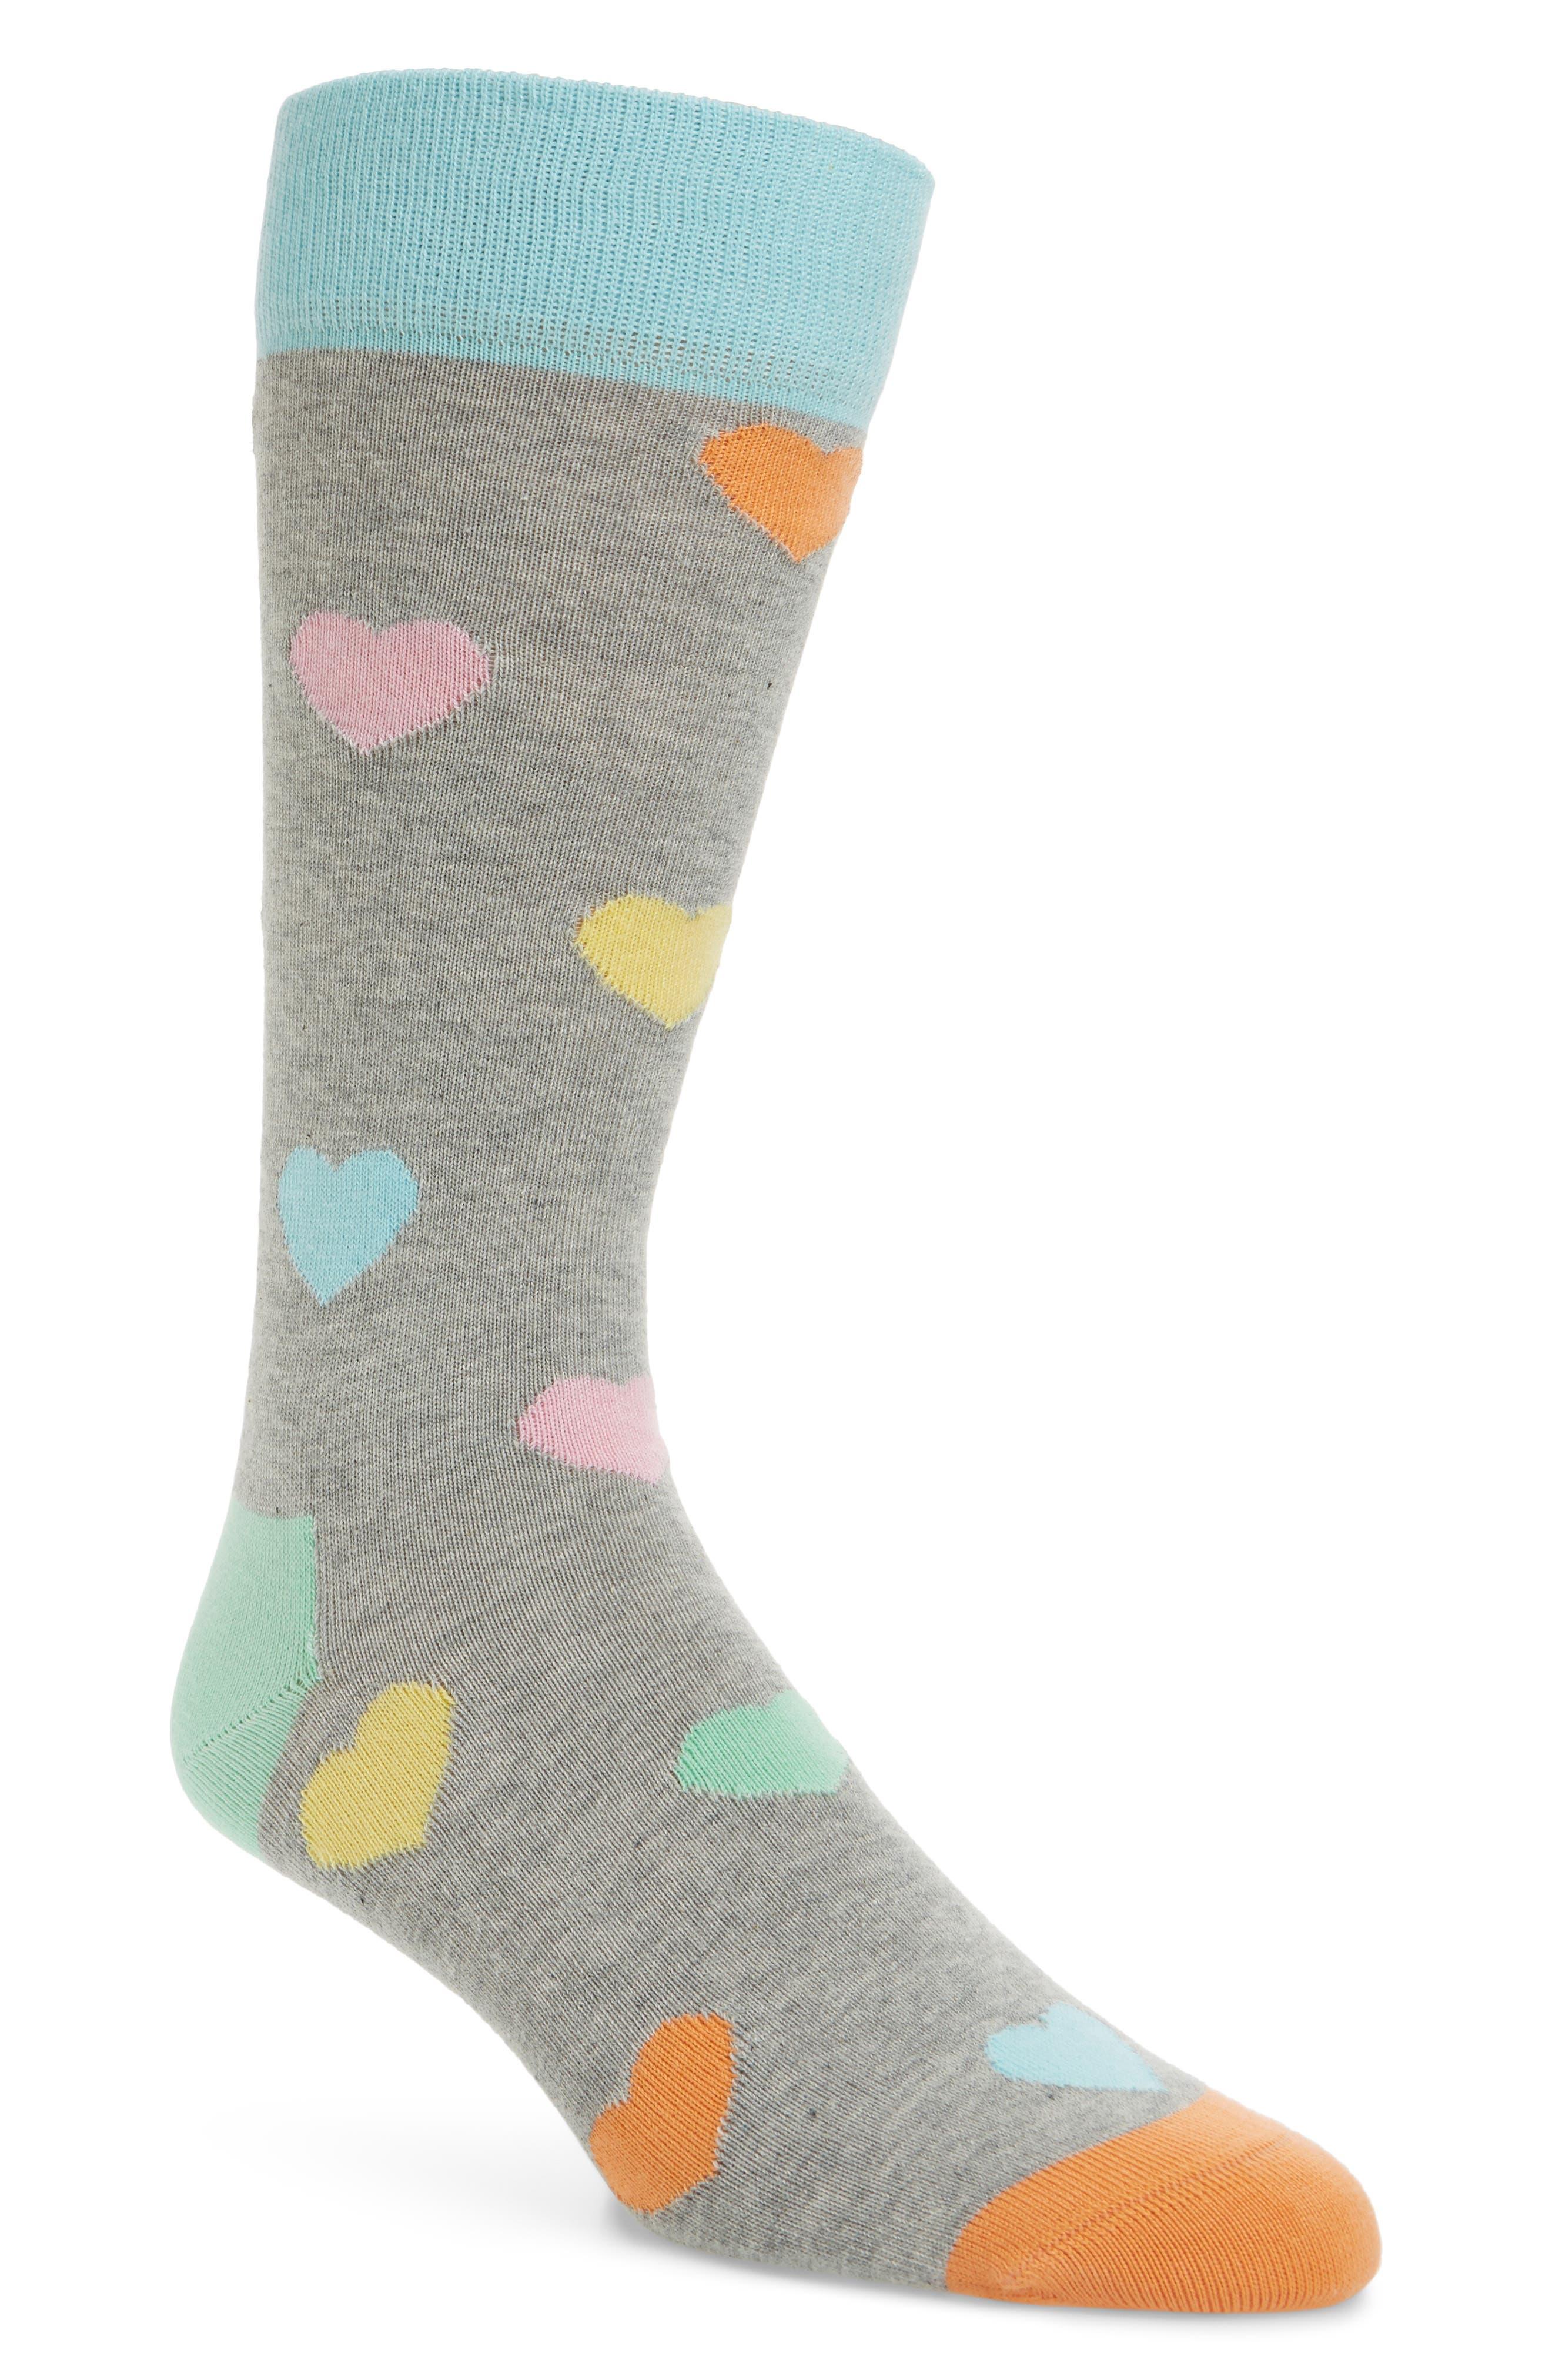 Hearts Socks,                             Main thumbnail 1, color,                             Grey Multi